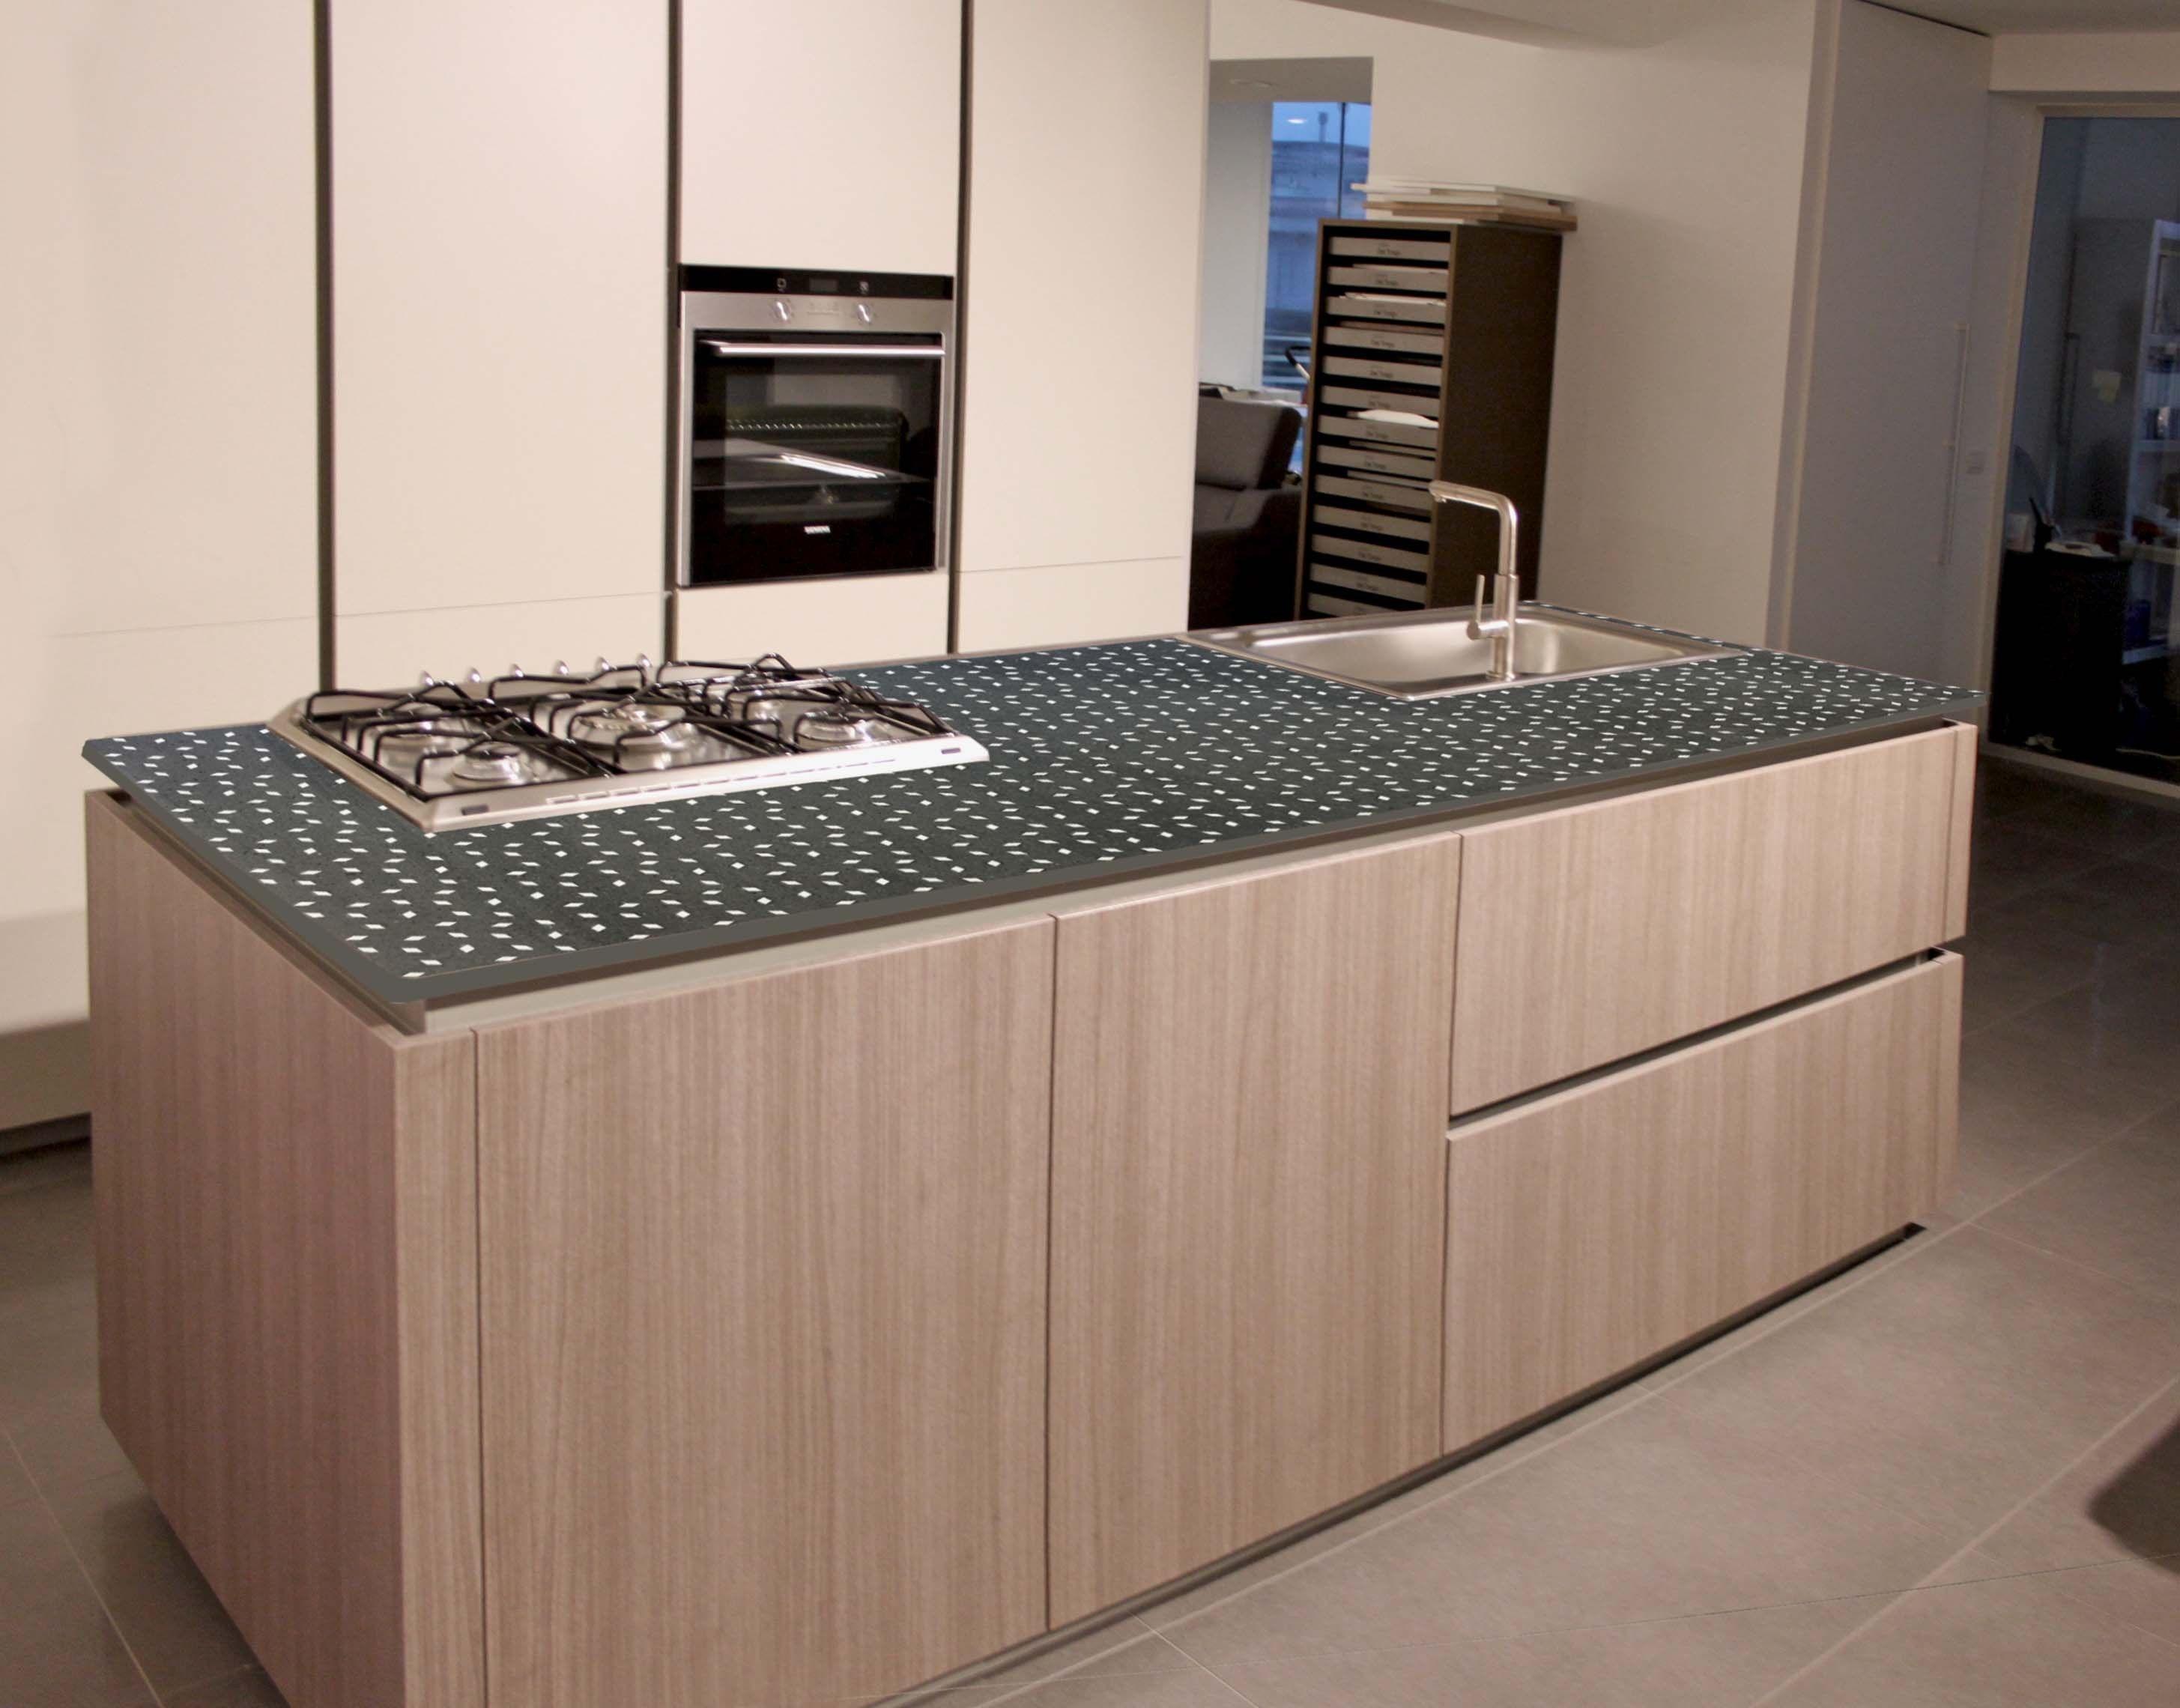 Rivestire top cucina rovinato terminali antivento per stufe a pellet - Top della cucina ...